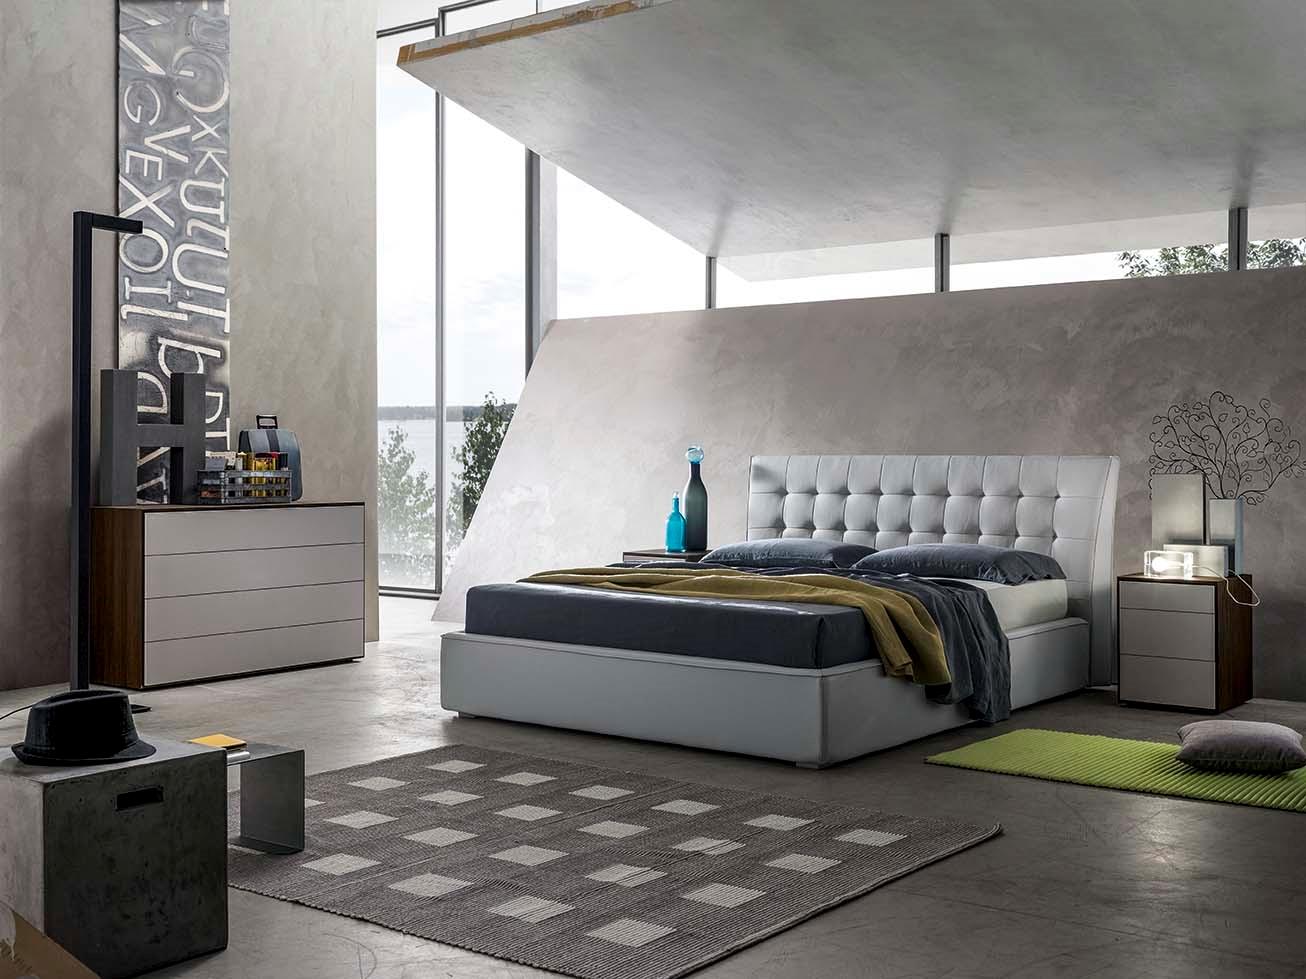 Emejing Santa Lucia Arredamenti Photos - Home Design Ideas 2017 ...